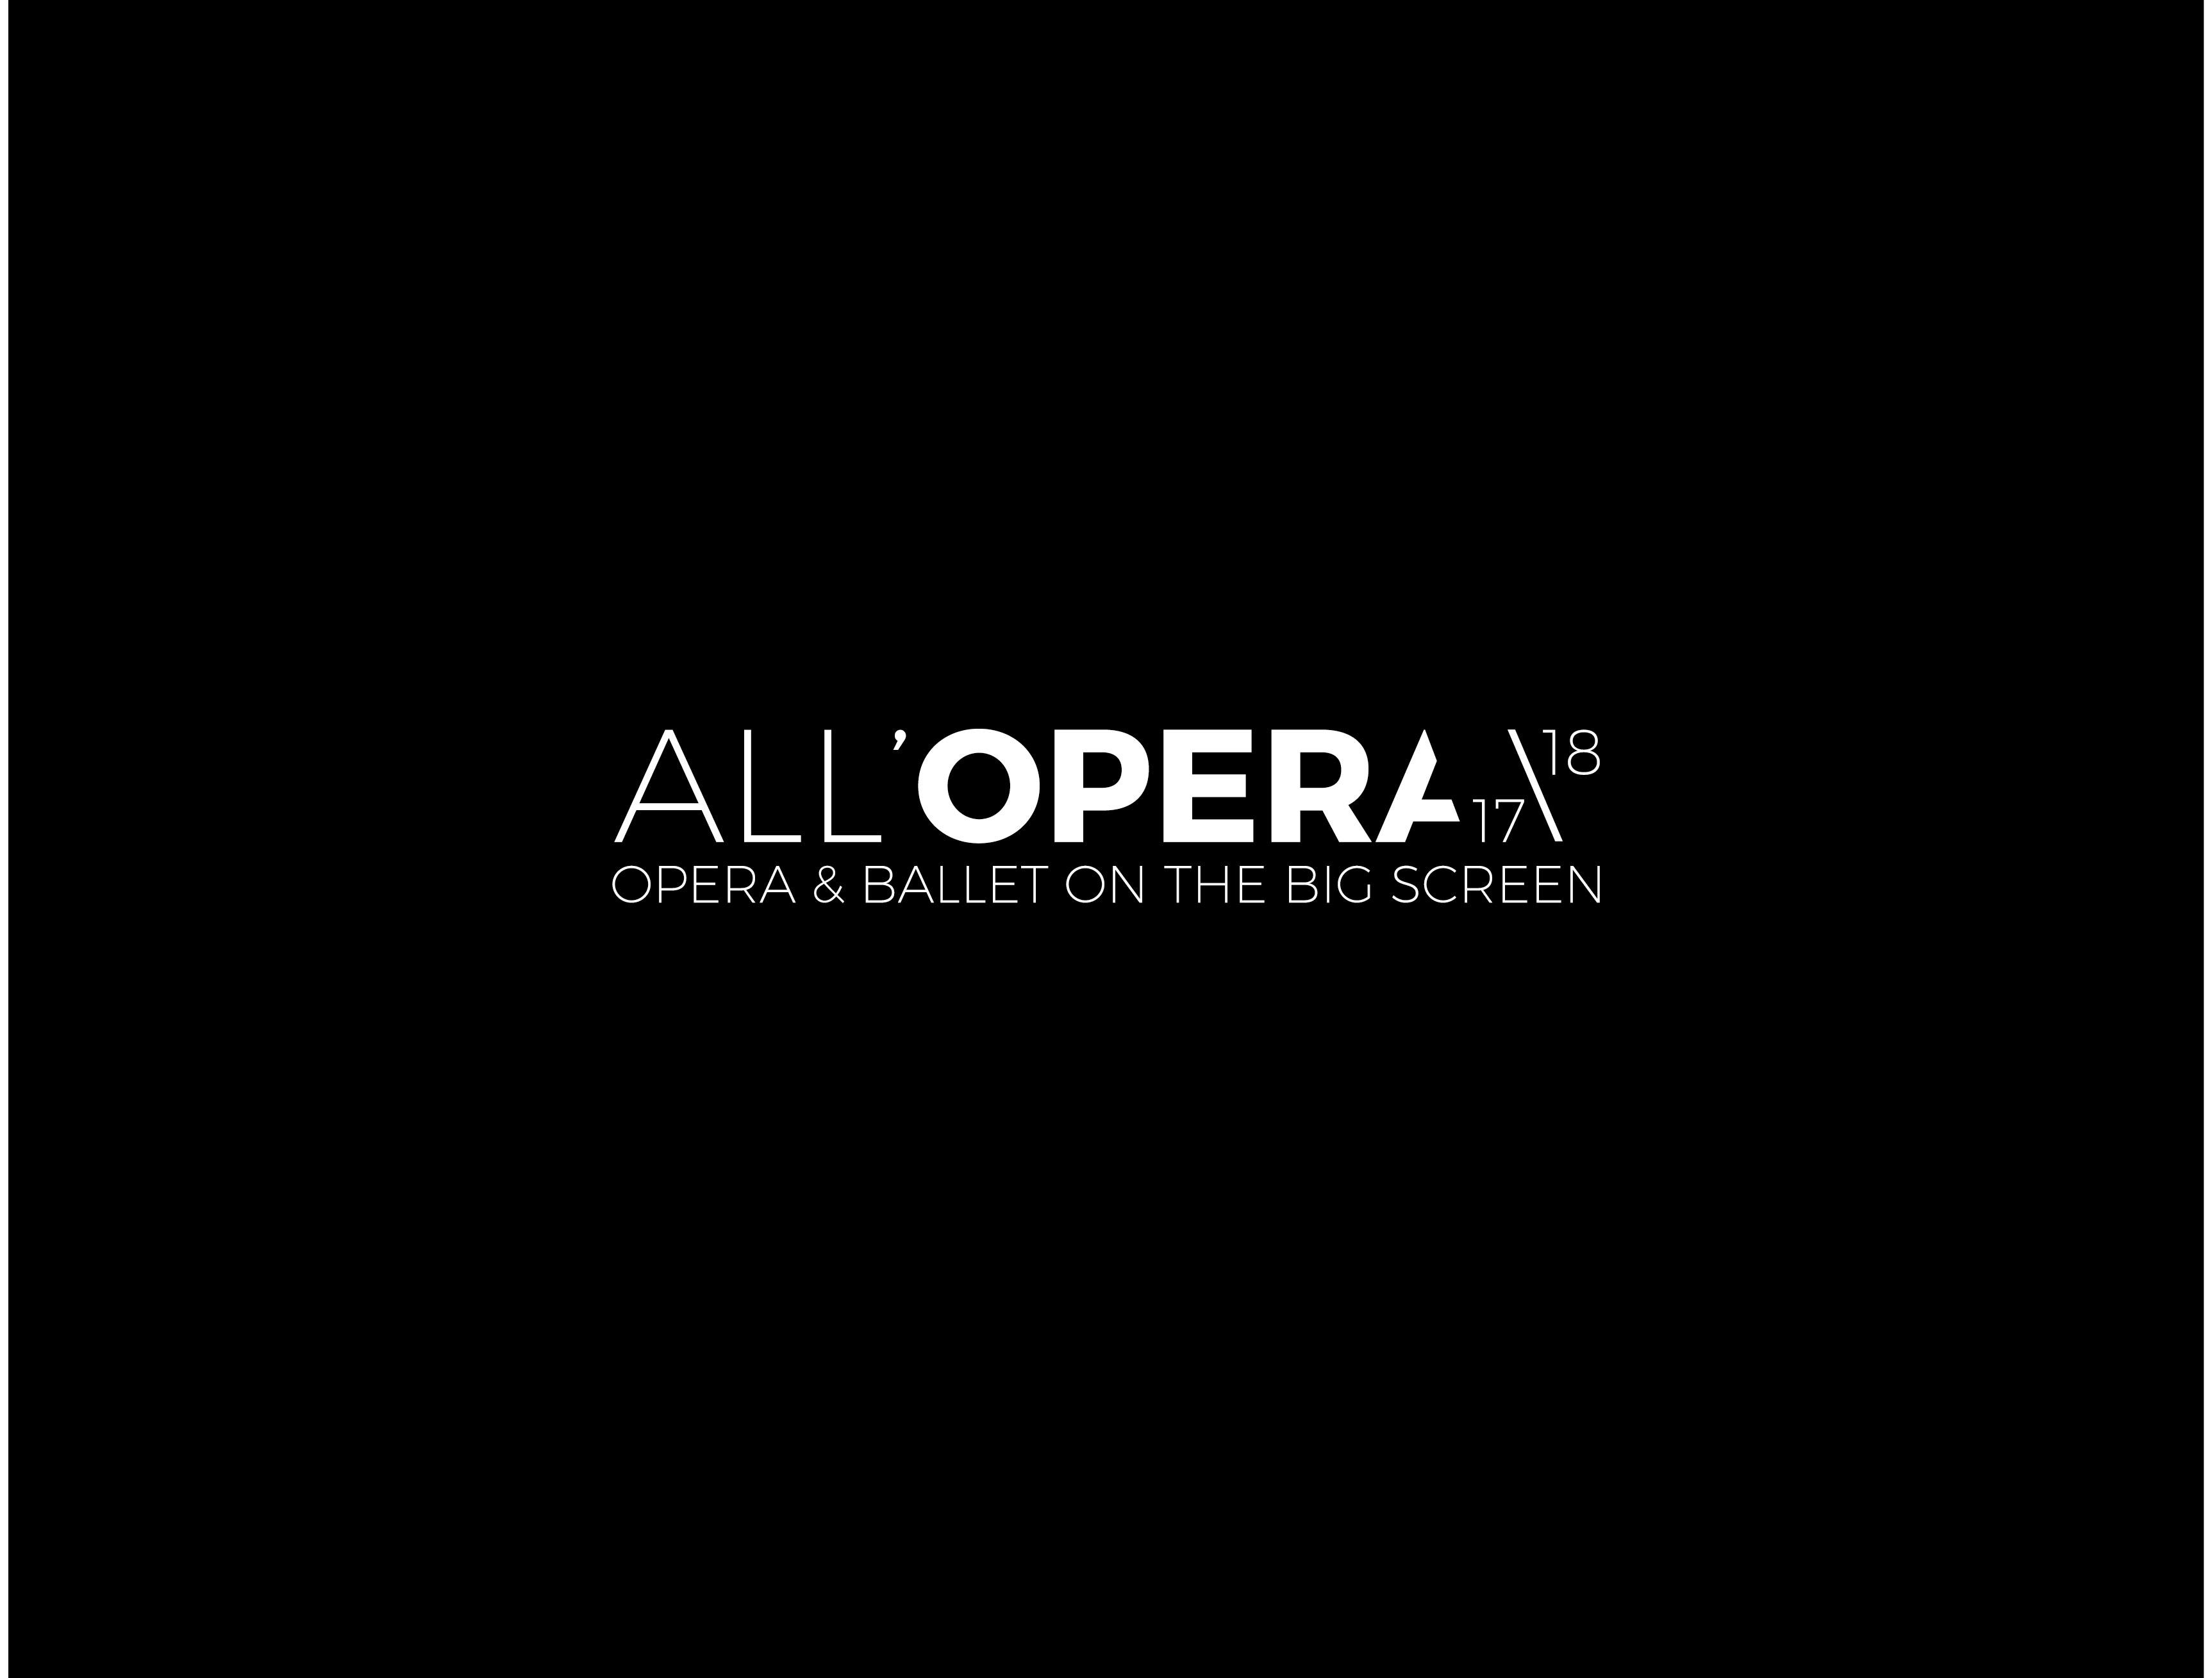 LOGO-ALLOPERA-17-18-01